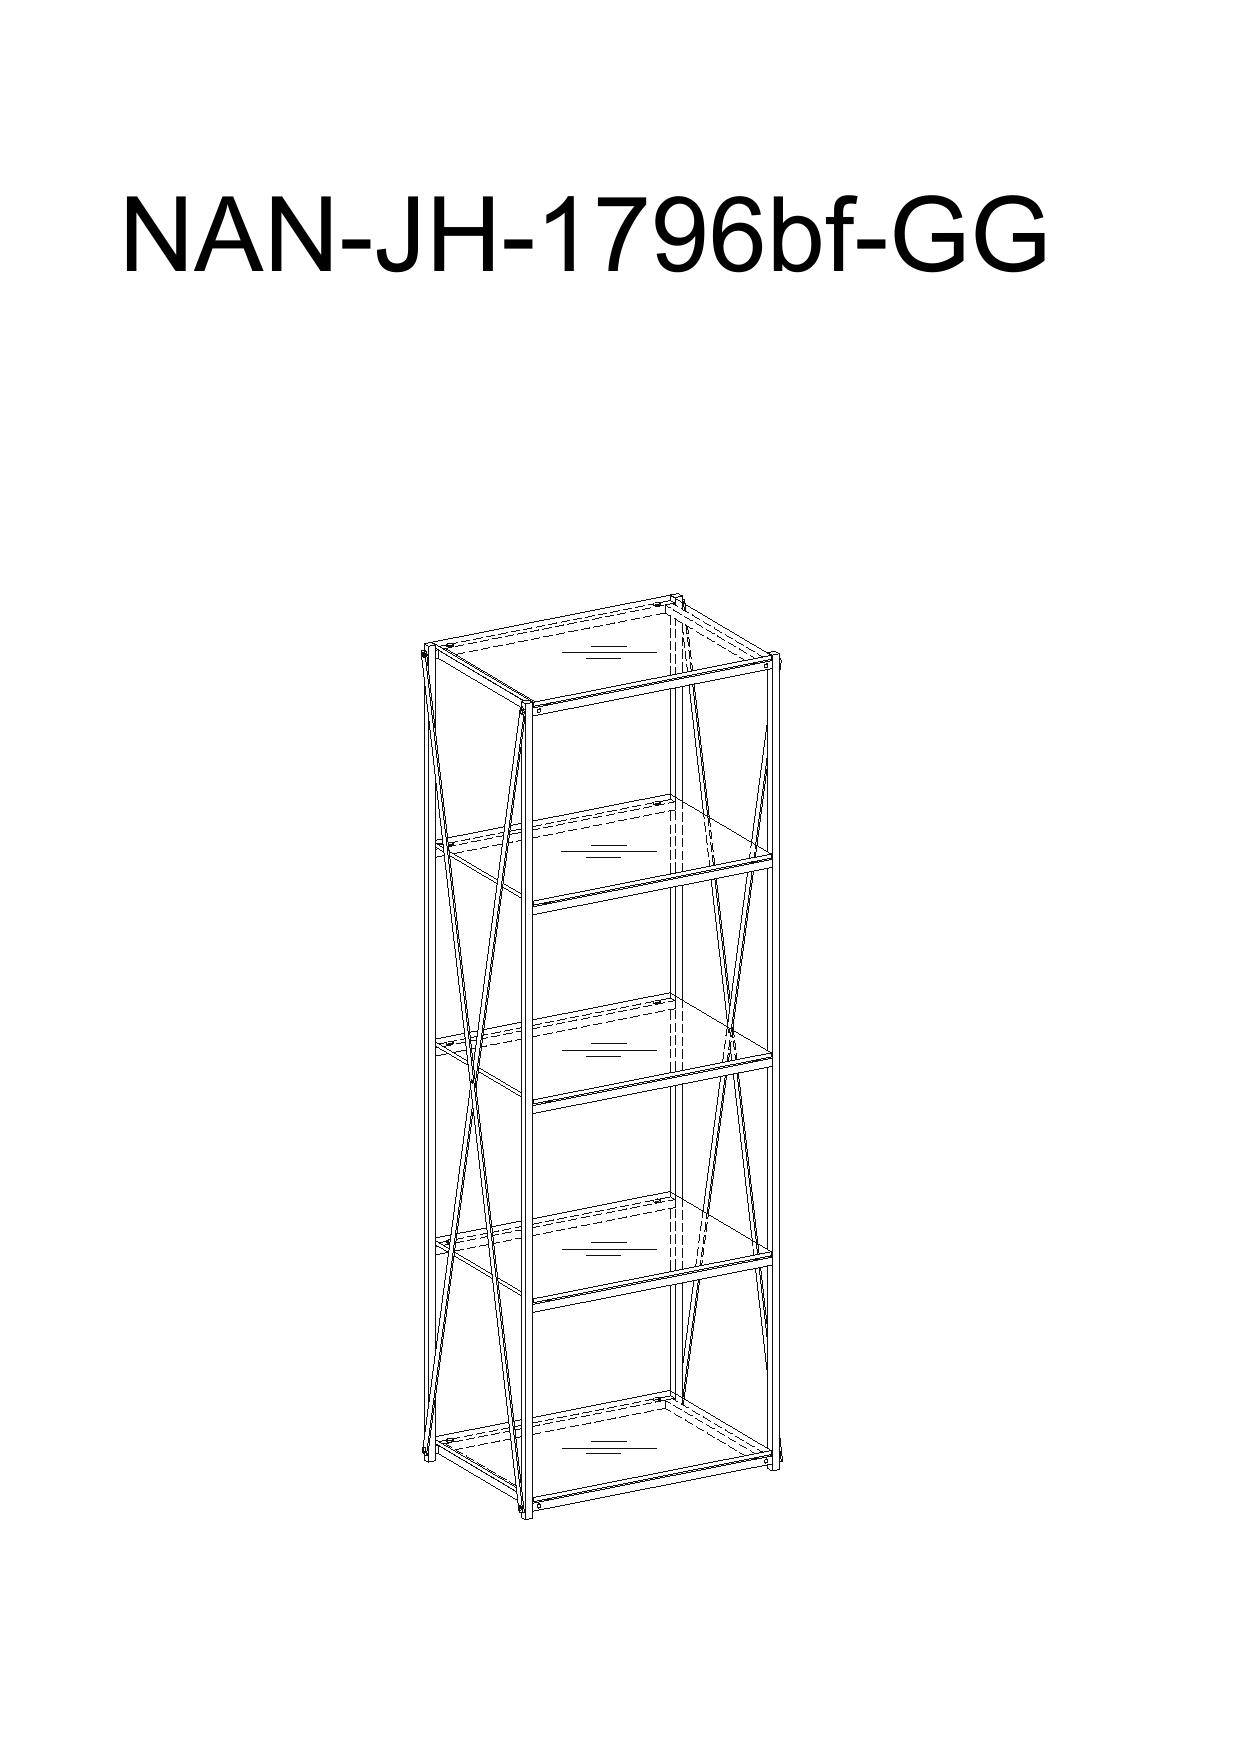 Flash Furniture NAN-JH-1796BF-GG Bookcase User Guide